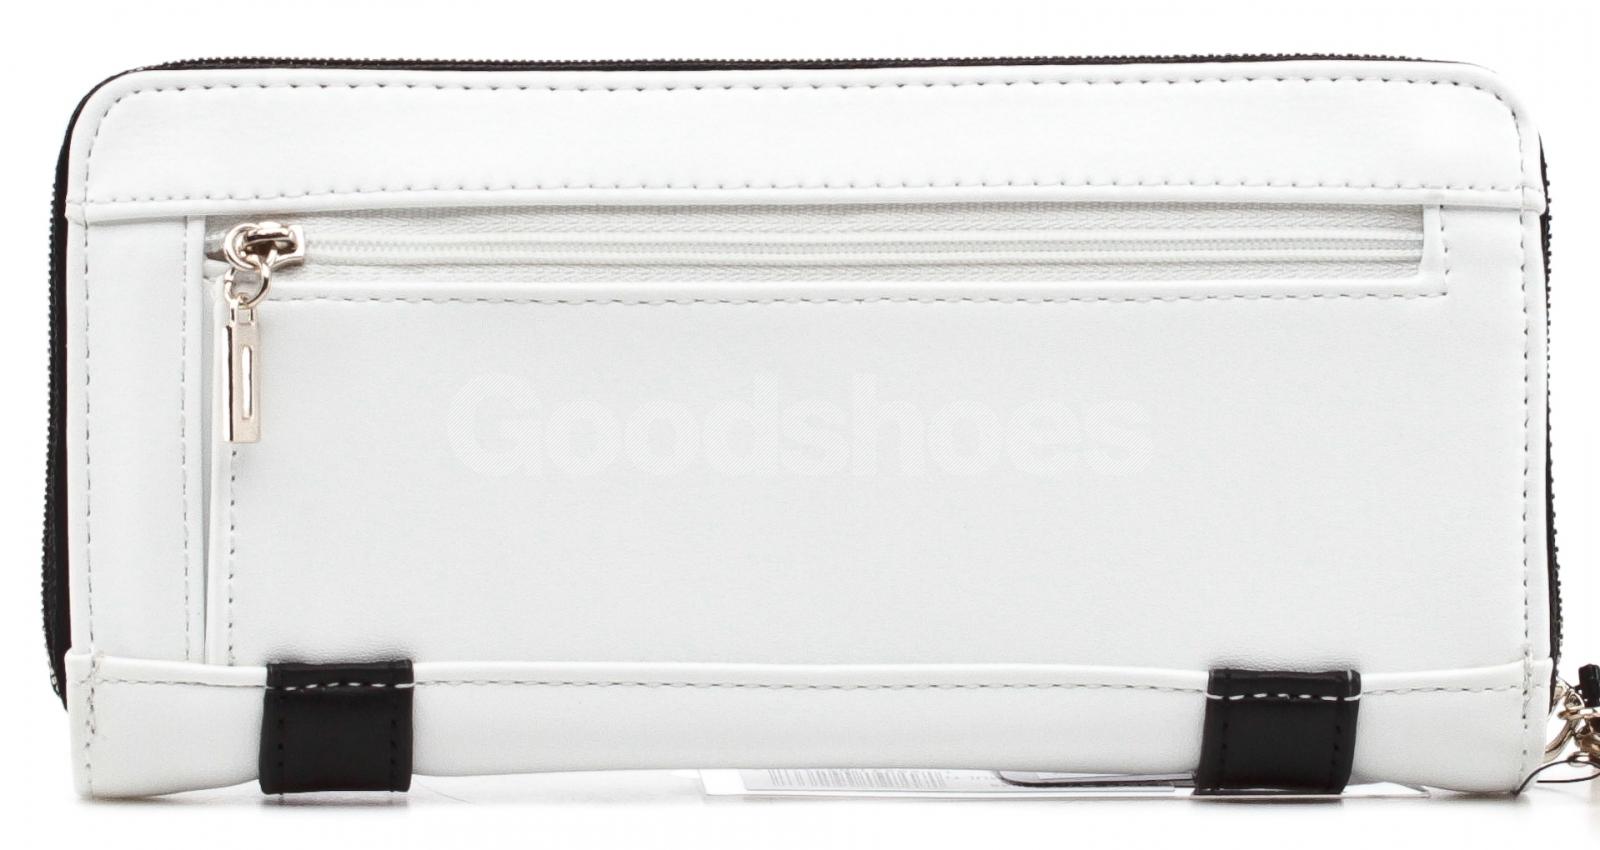 3e904f35e92d7 Portfel Damski GUESS Biały EXIE SLG SWVG68 60460 WML - Goodshoes.pl